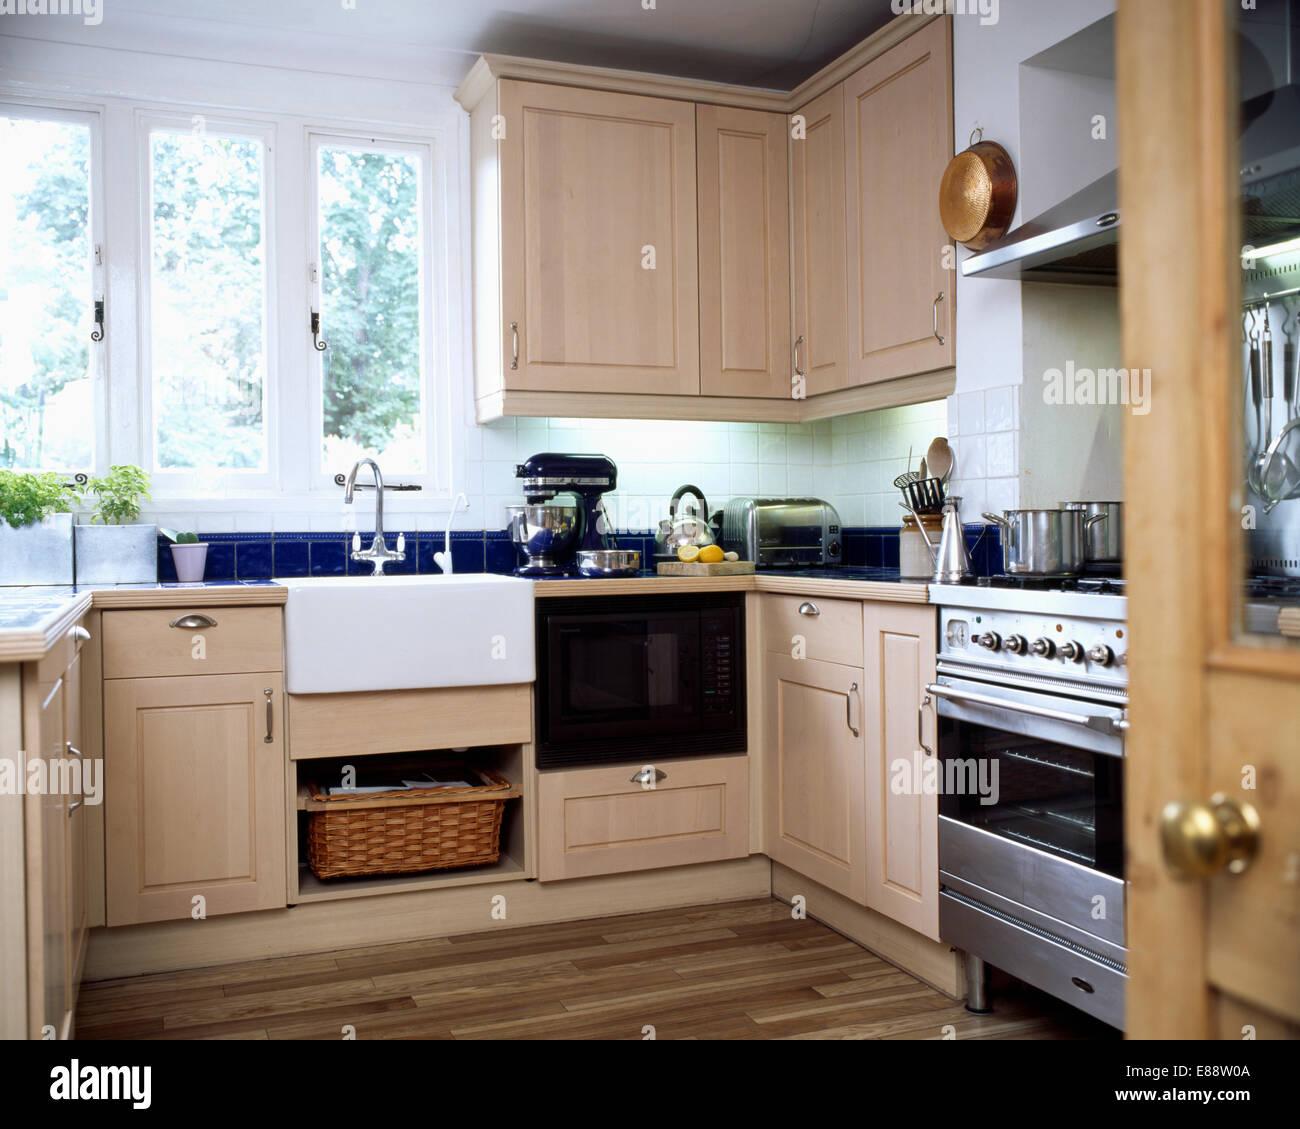 Kitchen Sink Not In Front Of Window: Belfast Sink Below Window In Modern Kitchen With Pale Wood